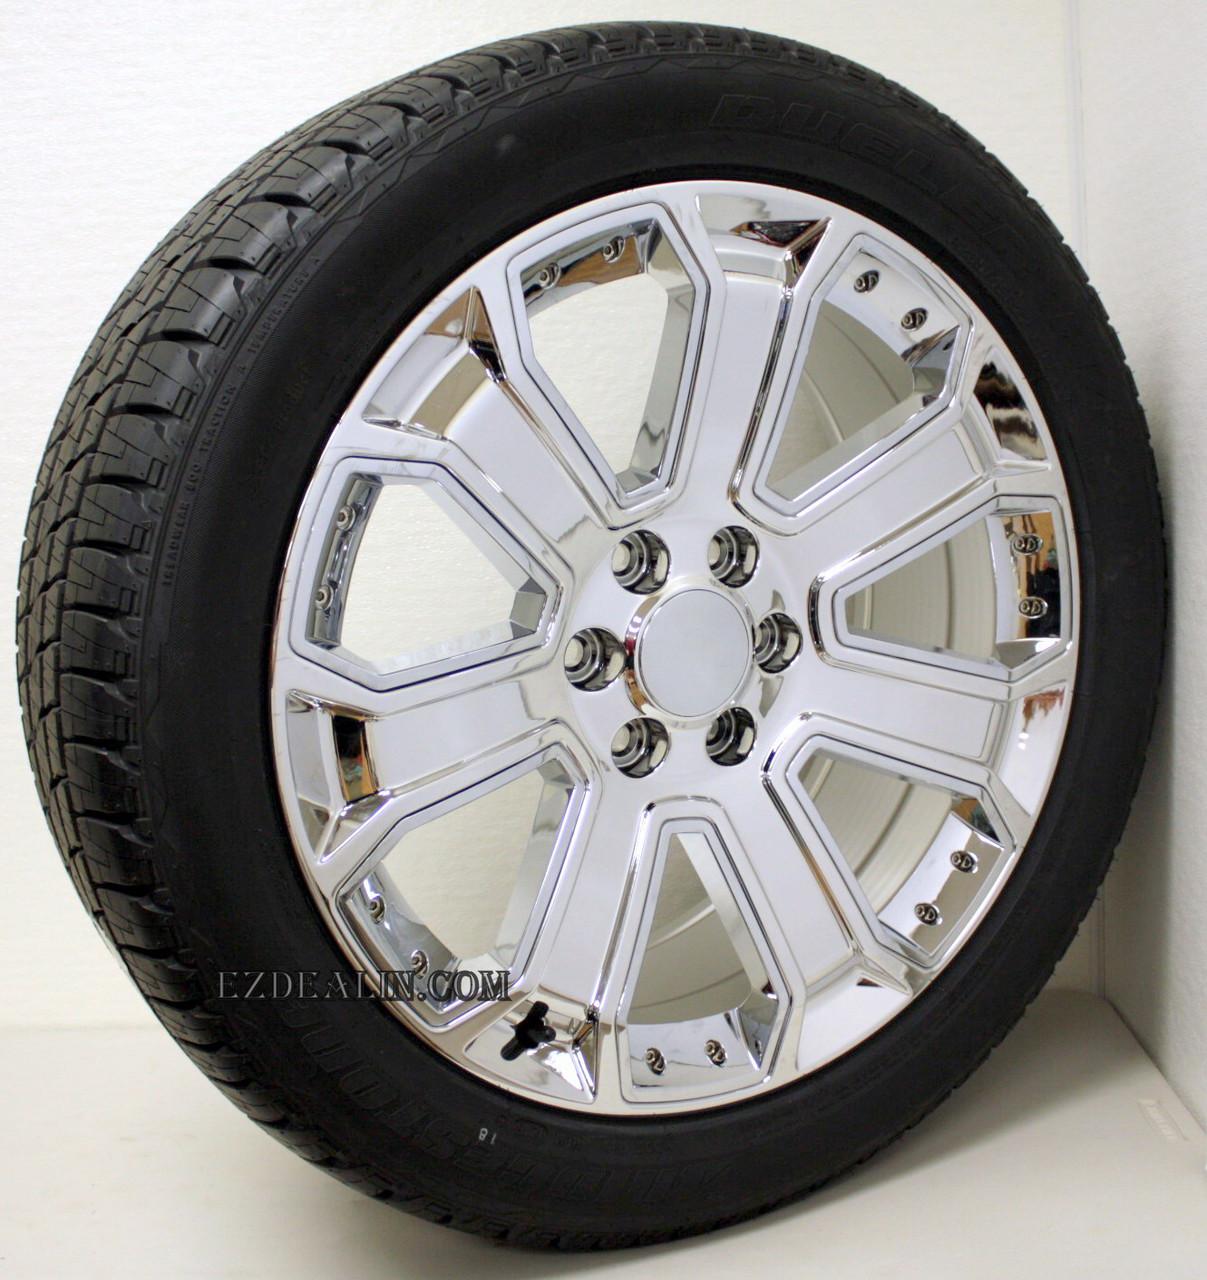 "Chrome 22"" With Chrome Inserts Wheels with Bridgestone Tires for GMC Sierra, Yukon, Denali - New Set of 4"